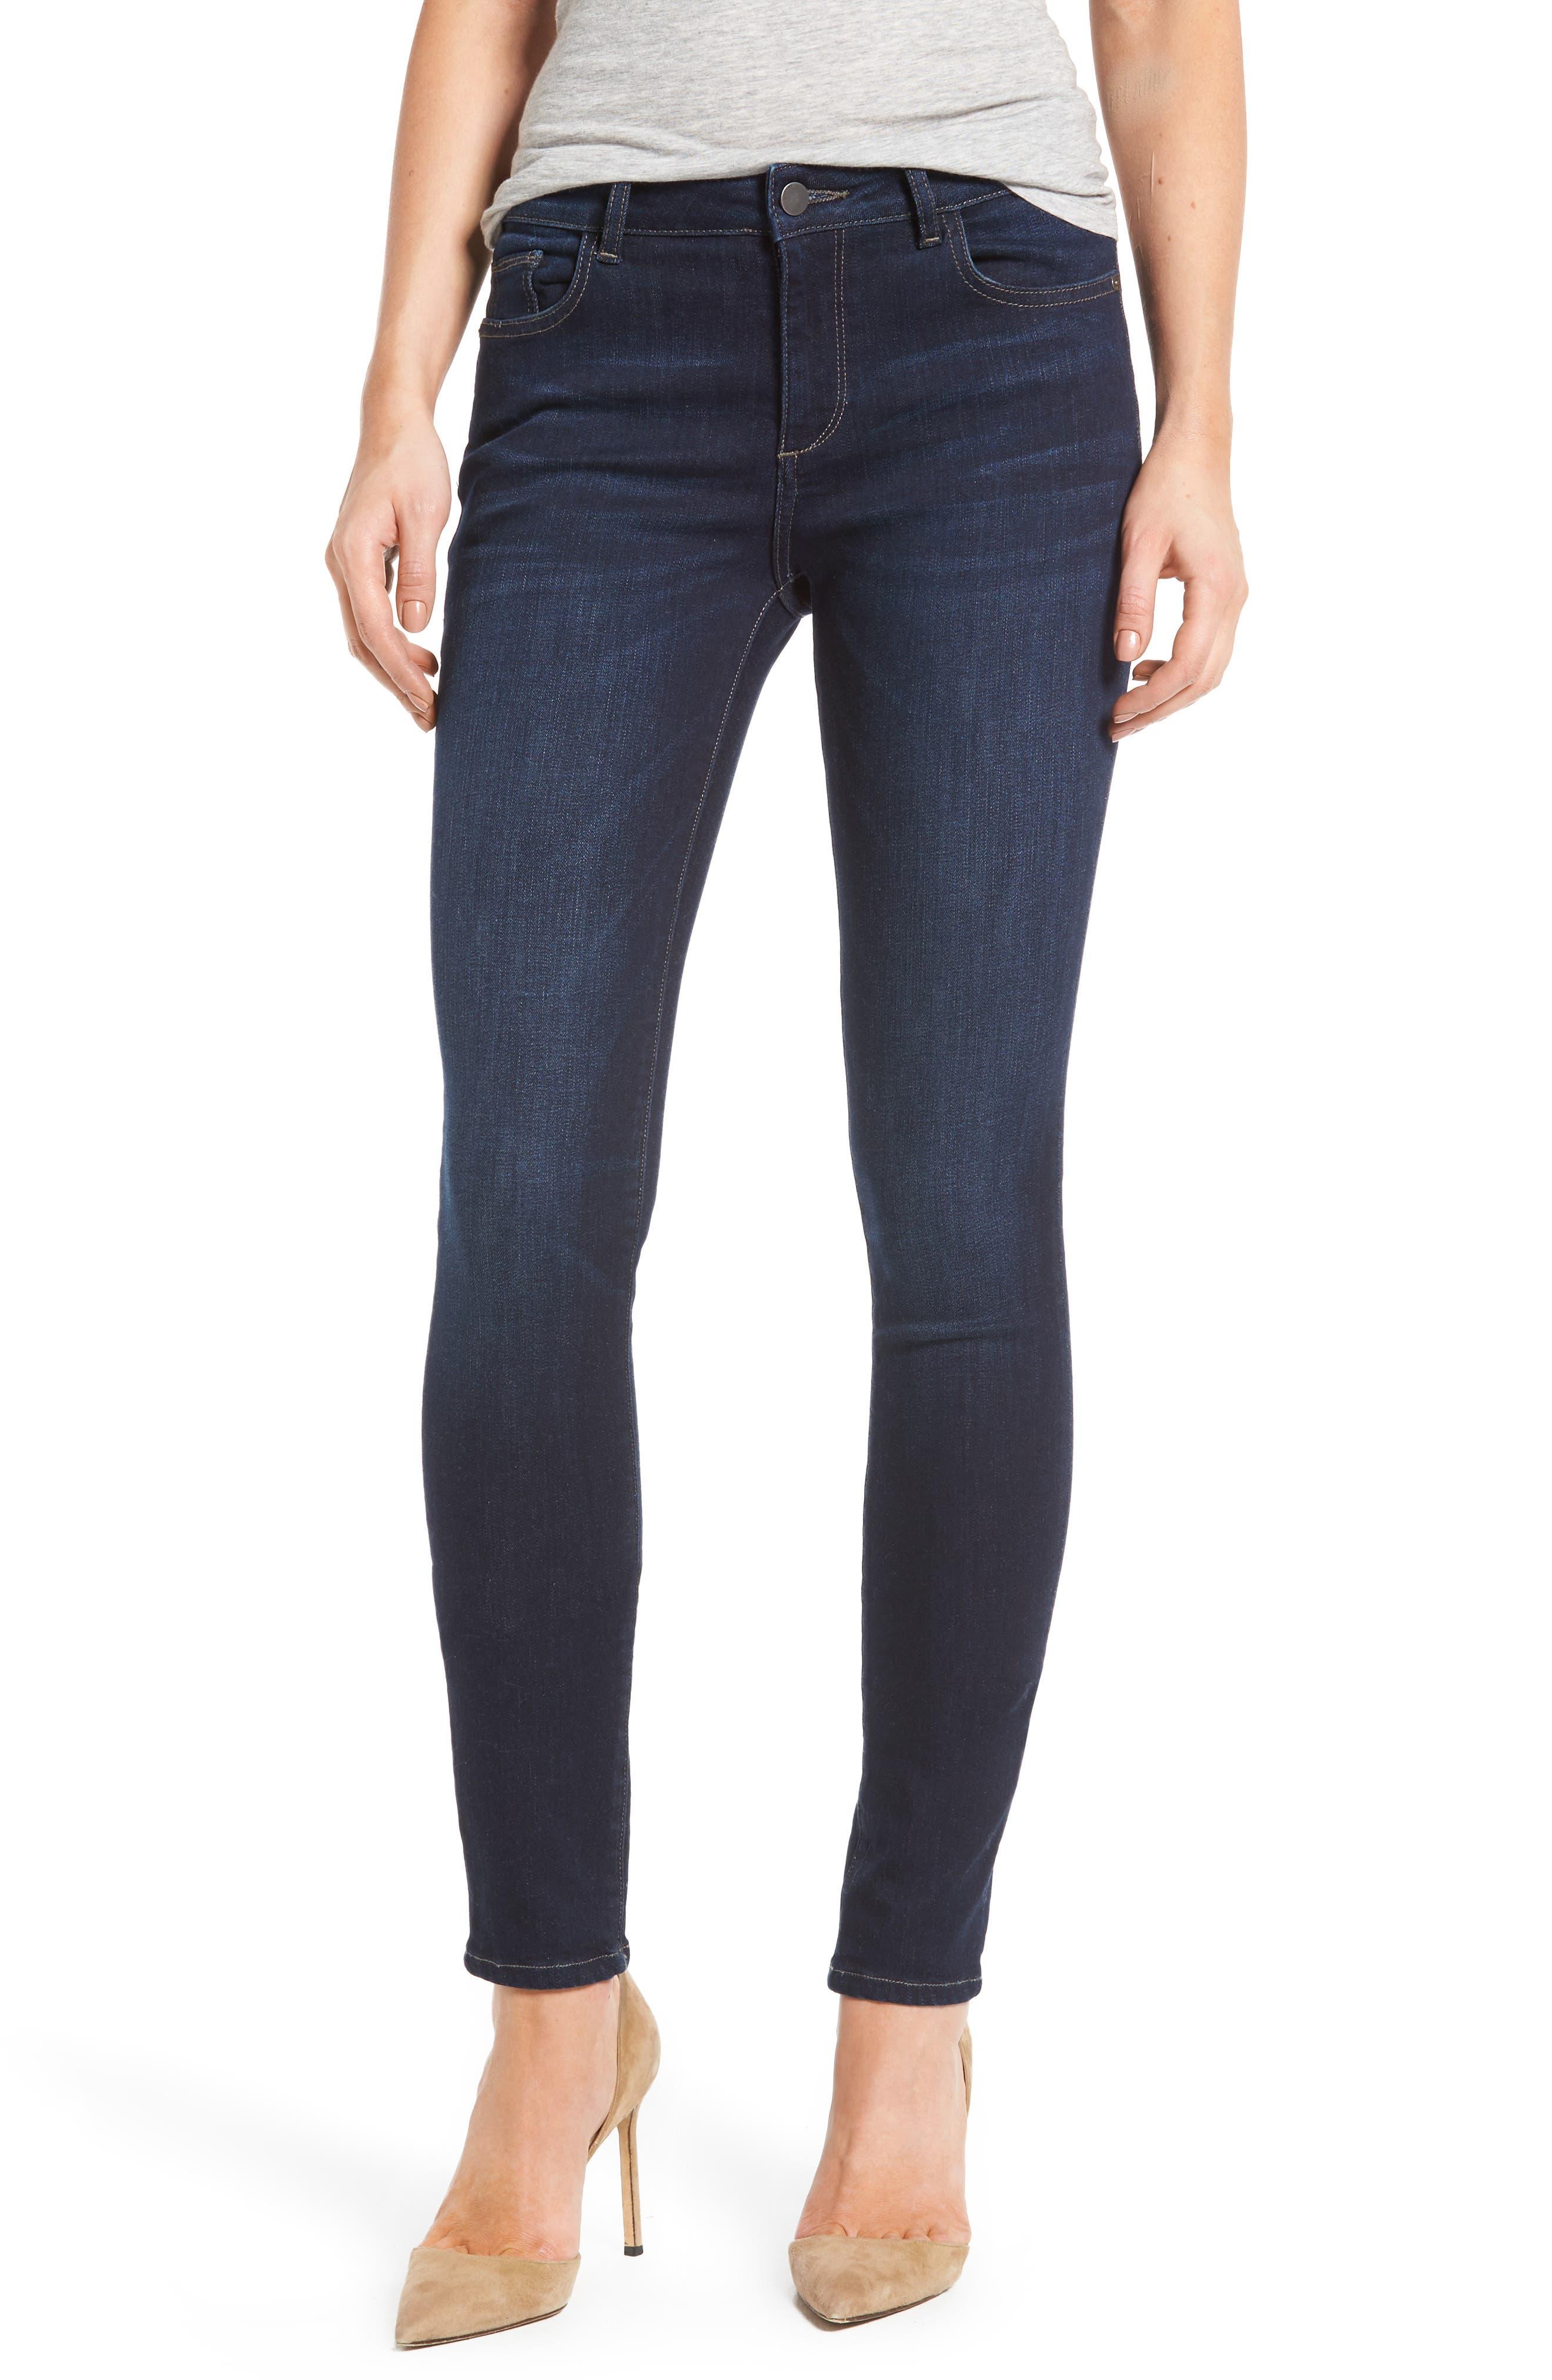 Main Image - DL1961 Florence Instasculpt Skinny Jeans (Crux)